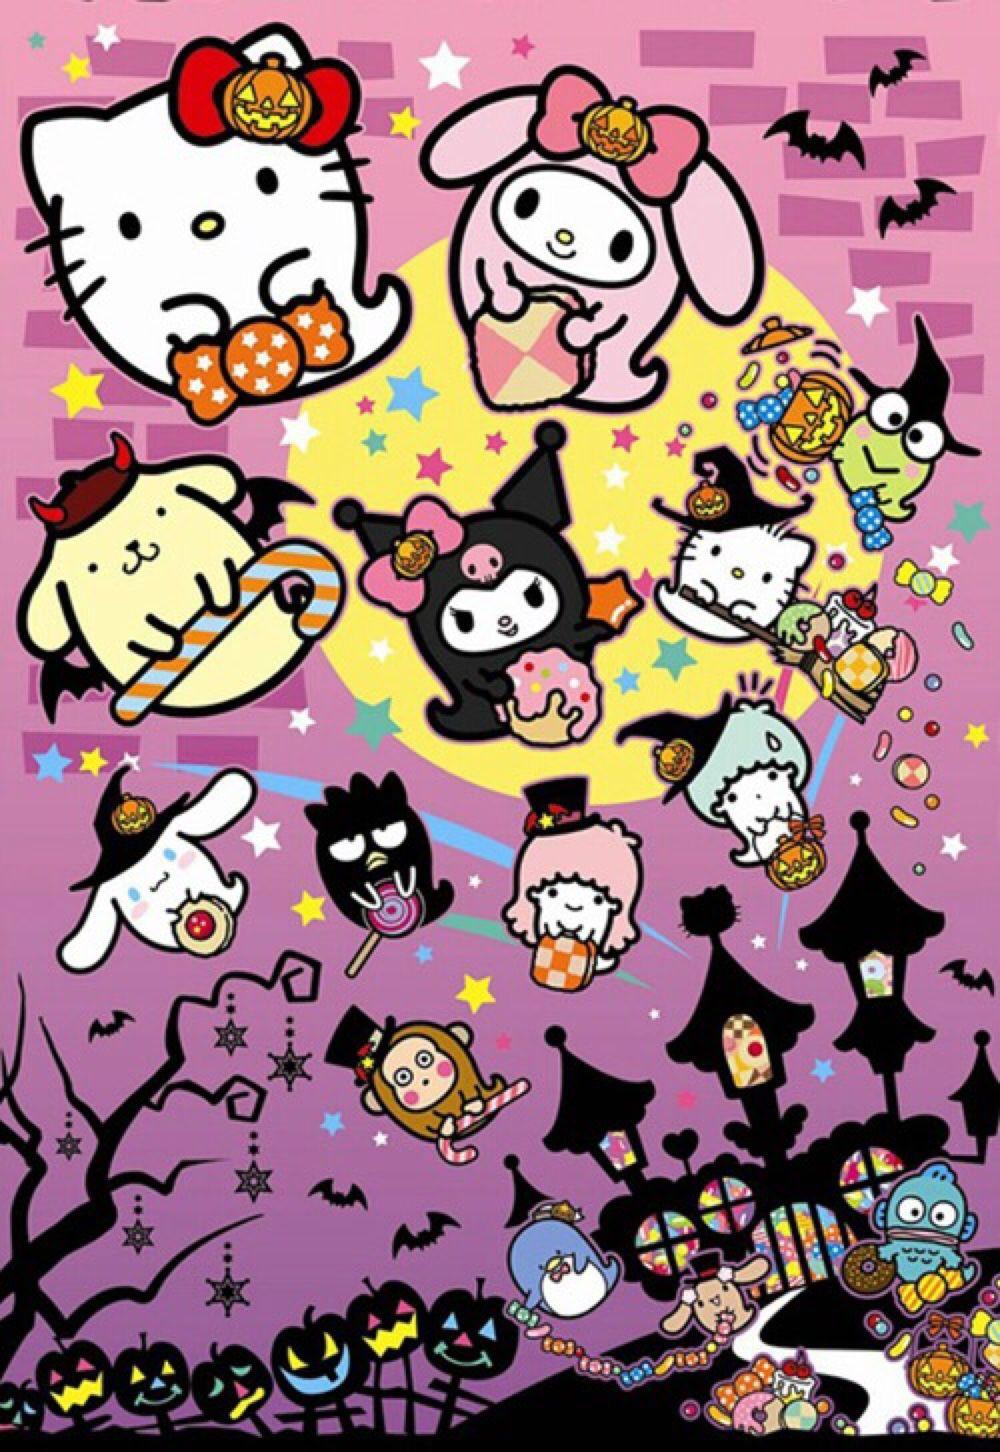 Best Wallpaper Halloween Hello Kitty - c291ce9779bea627c3bf0e2fb11f47c3  Collection_94434.jpg